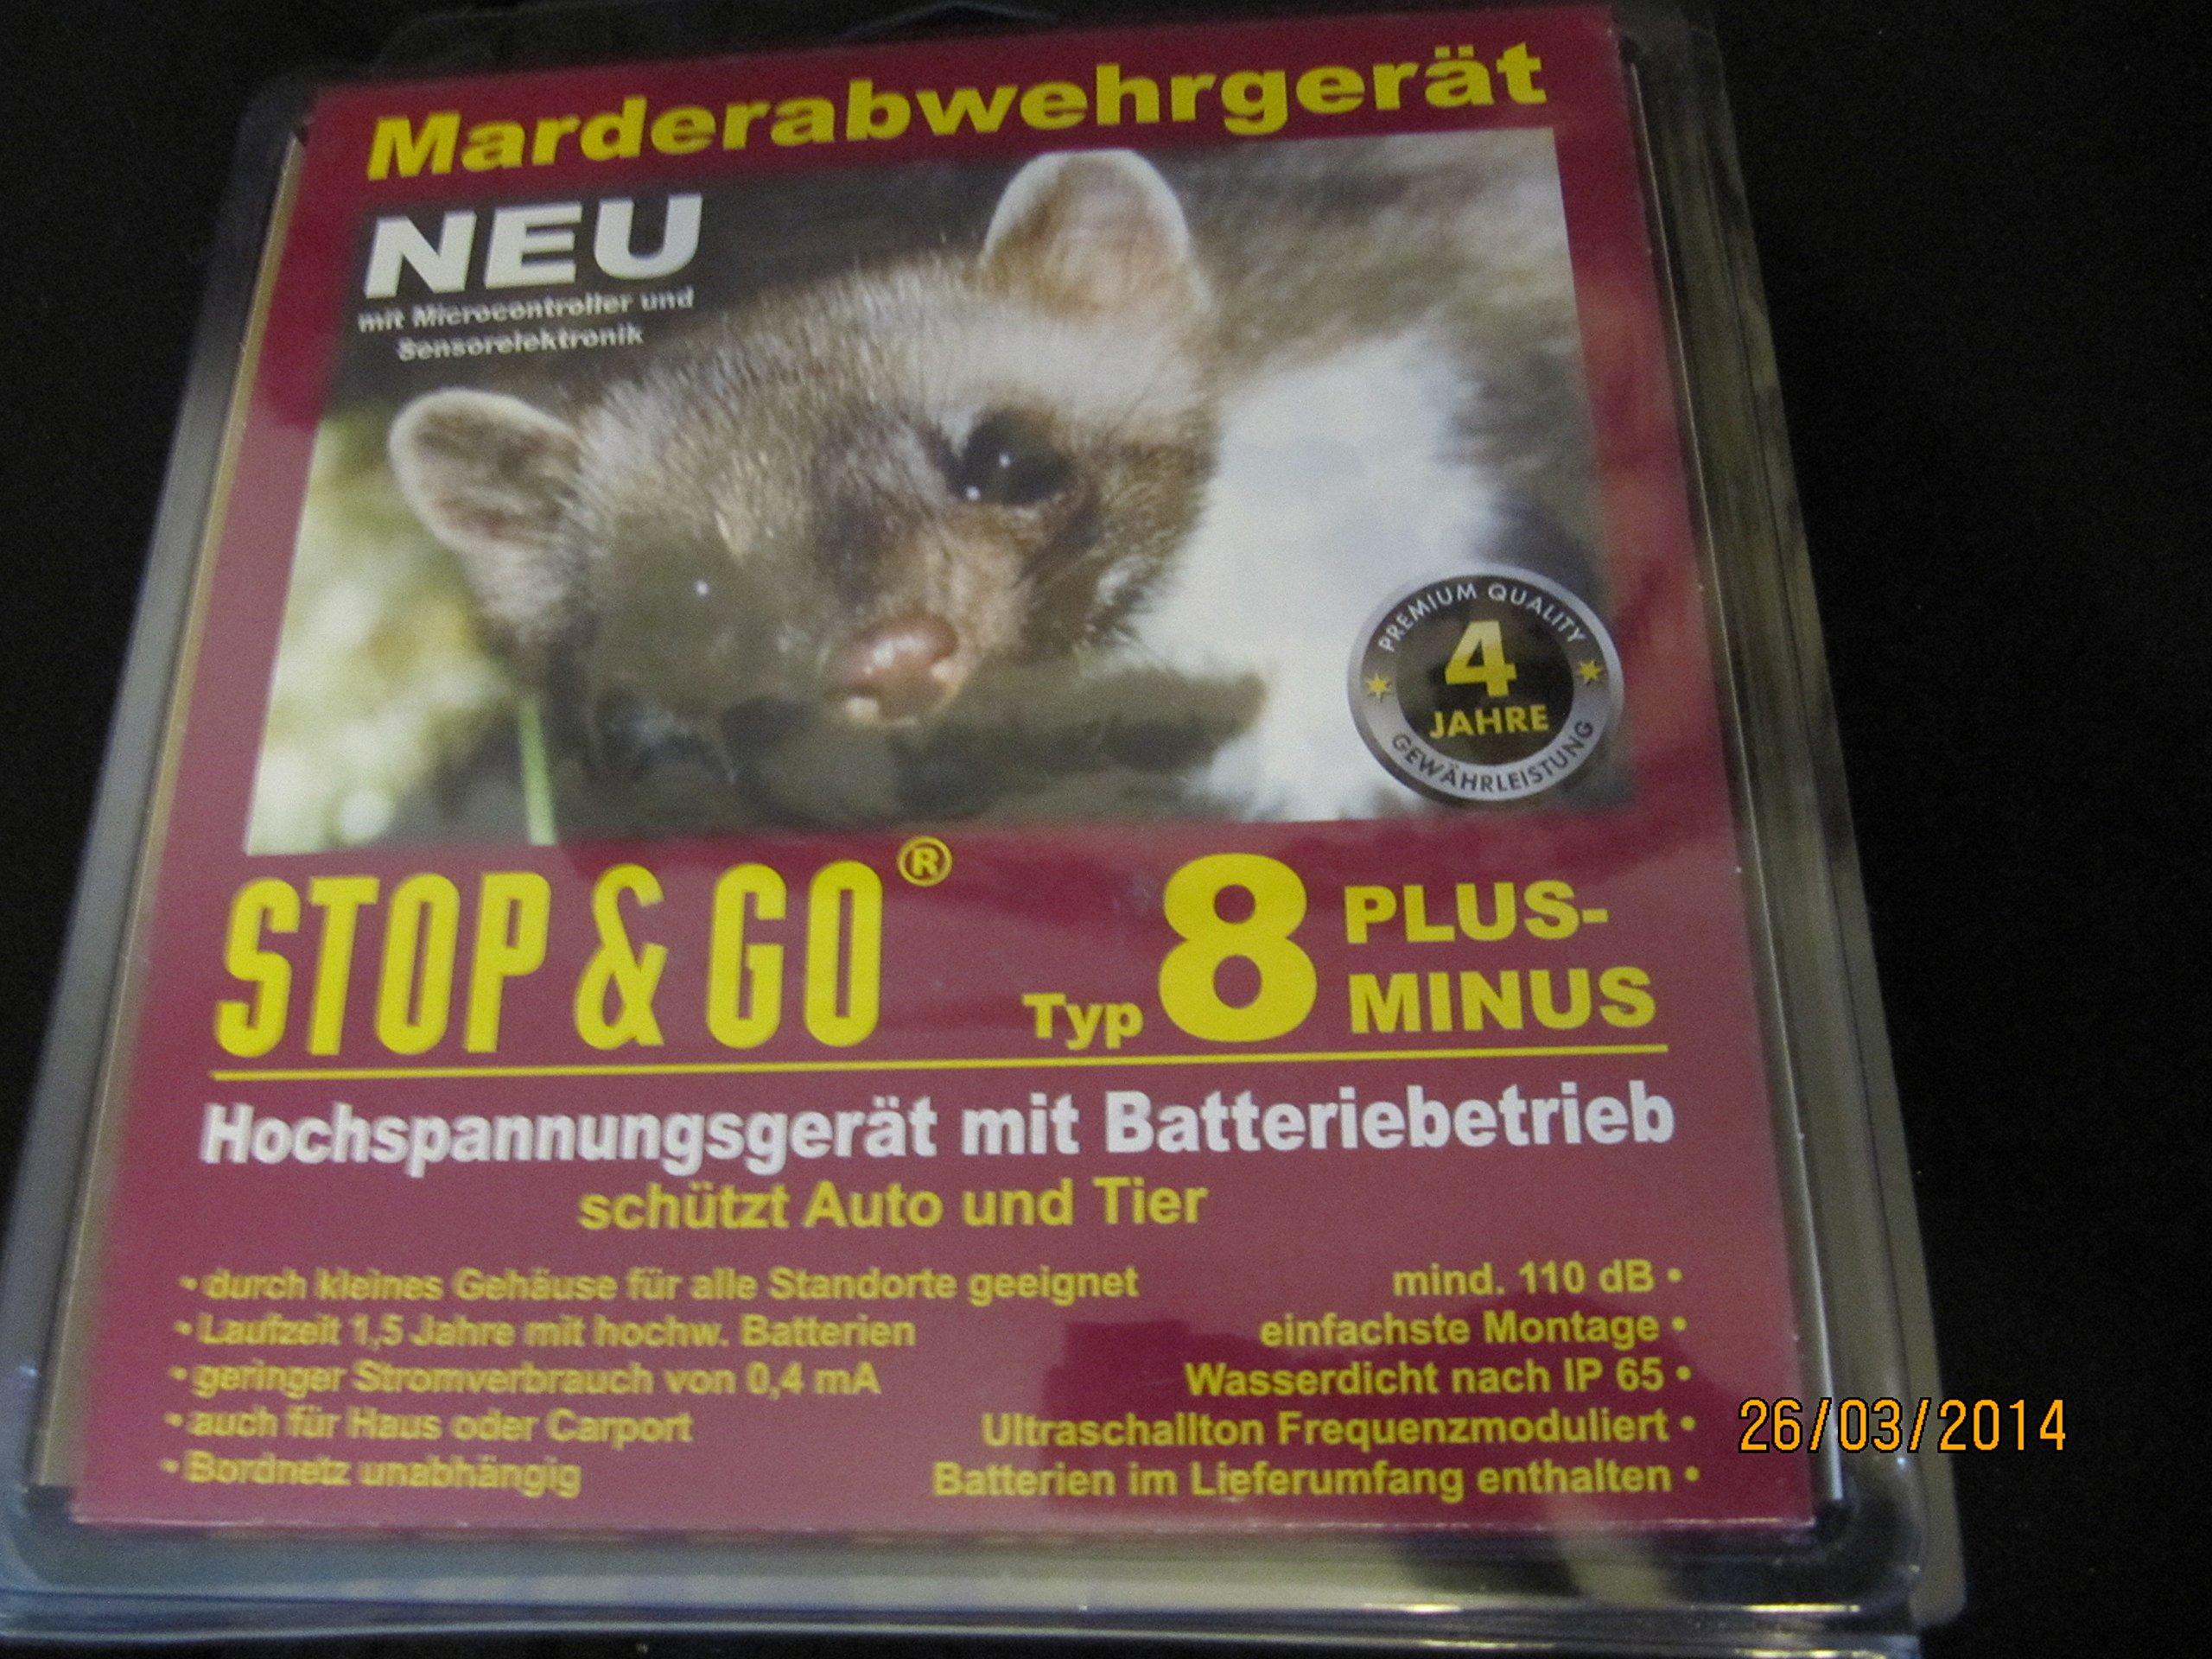 STOP & GO Marderabwehr Typ 8 PLUS-MINUS Hochspannung+Ultraschall+Batterie 07544 product image